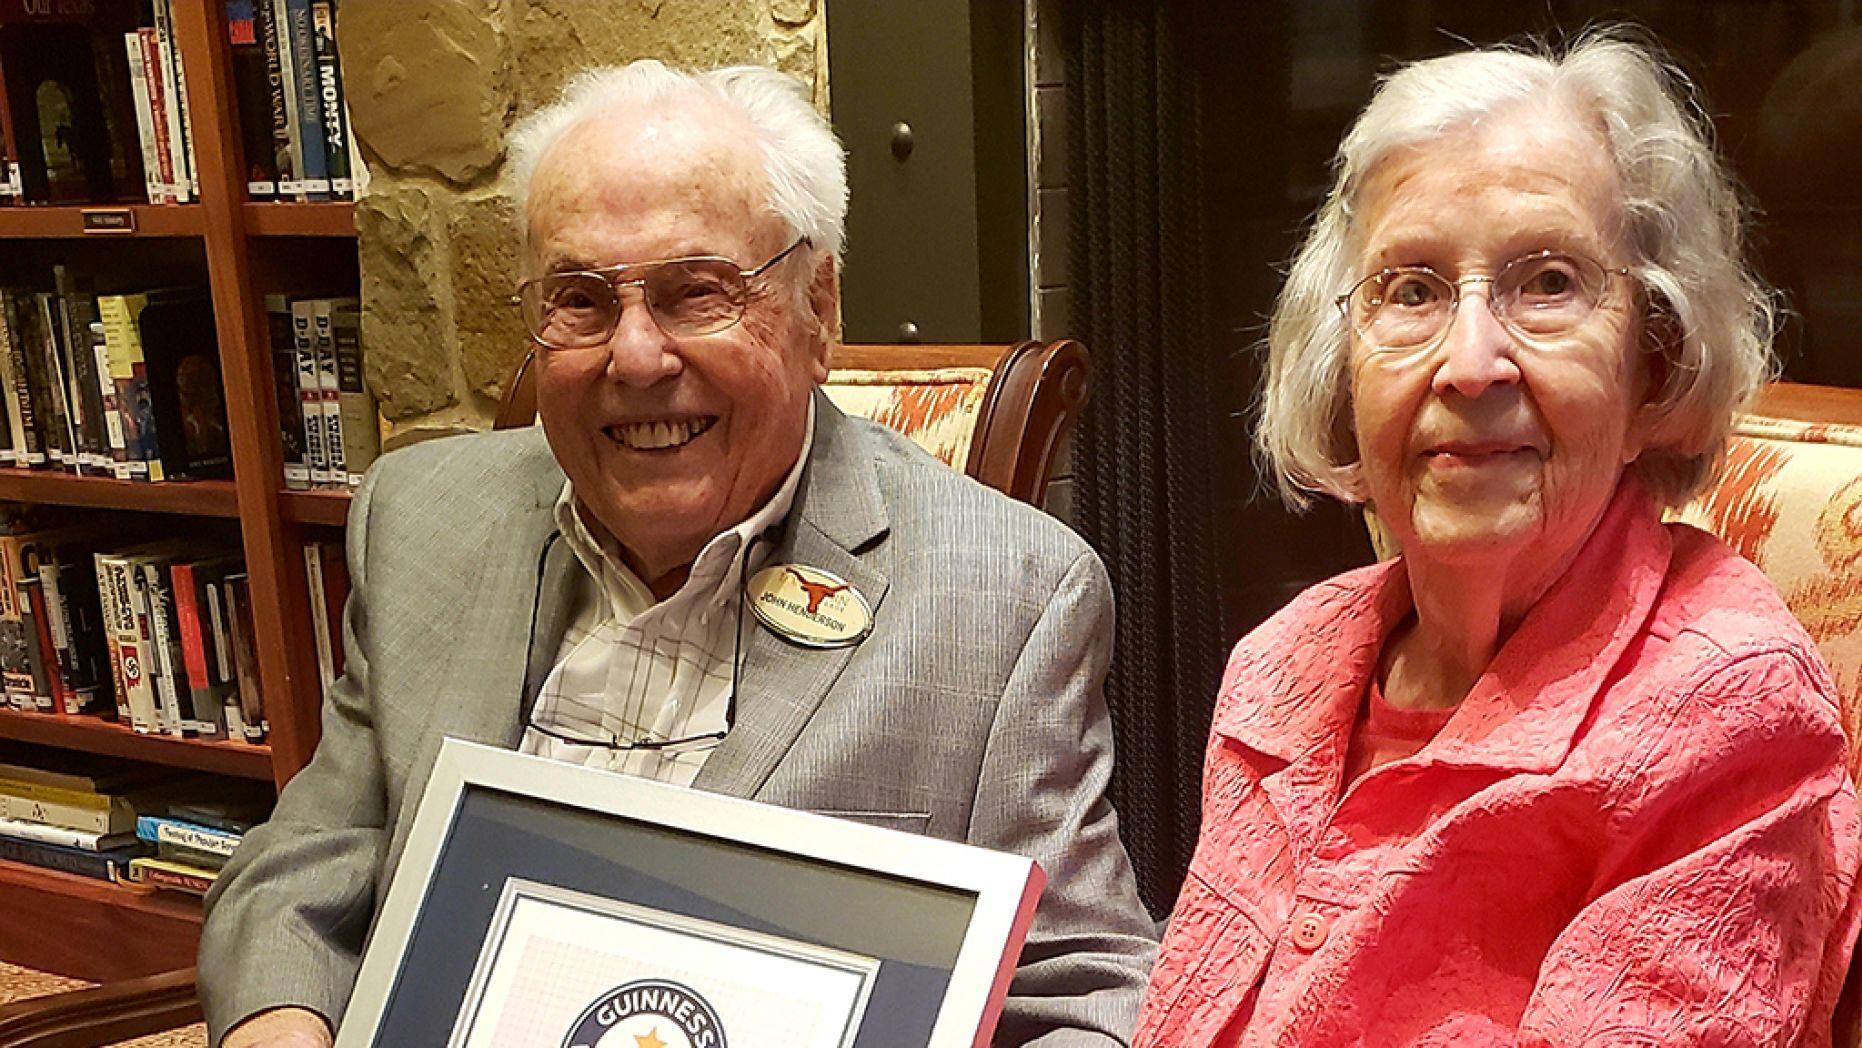 Texas pair John Henderson, 106, and Charlotte Curtis, 105, celebrated their latest wedding anniversary Dec. 15.